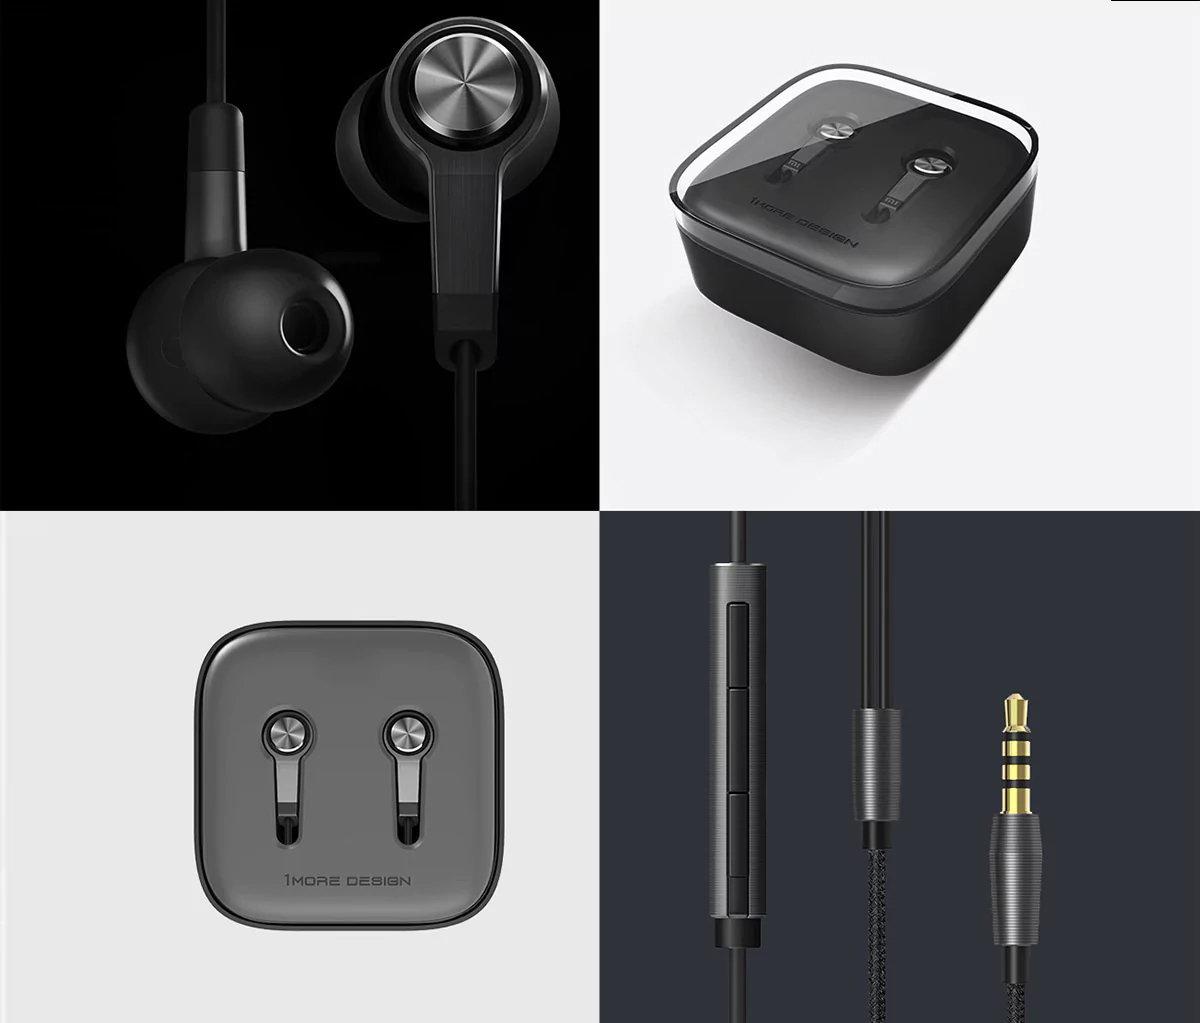 accessoires smartphones - Oreillettes XIAOMI Piston 3 Redot Design - 19